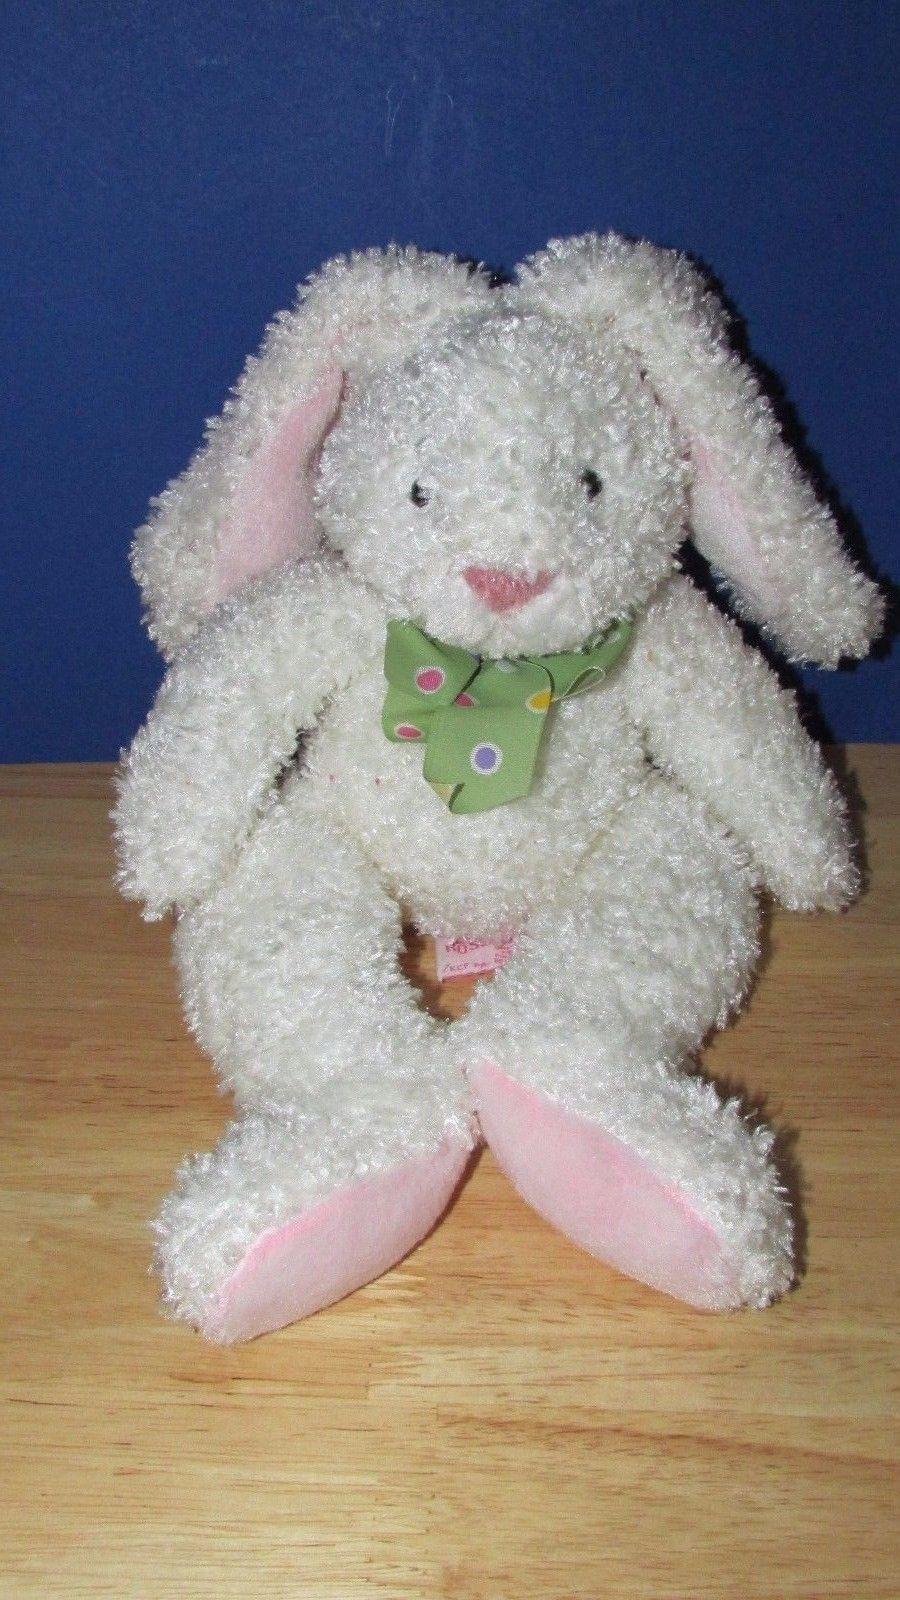 Cuddly Bunny Shimmery